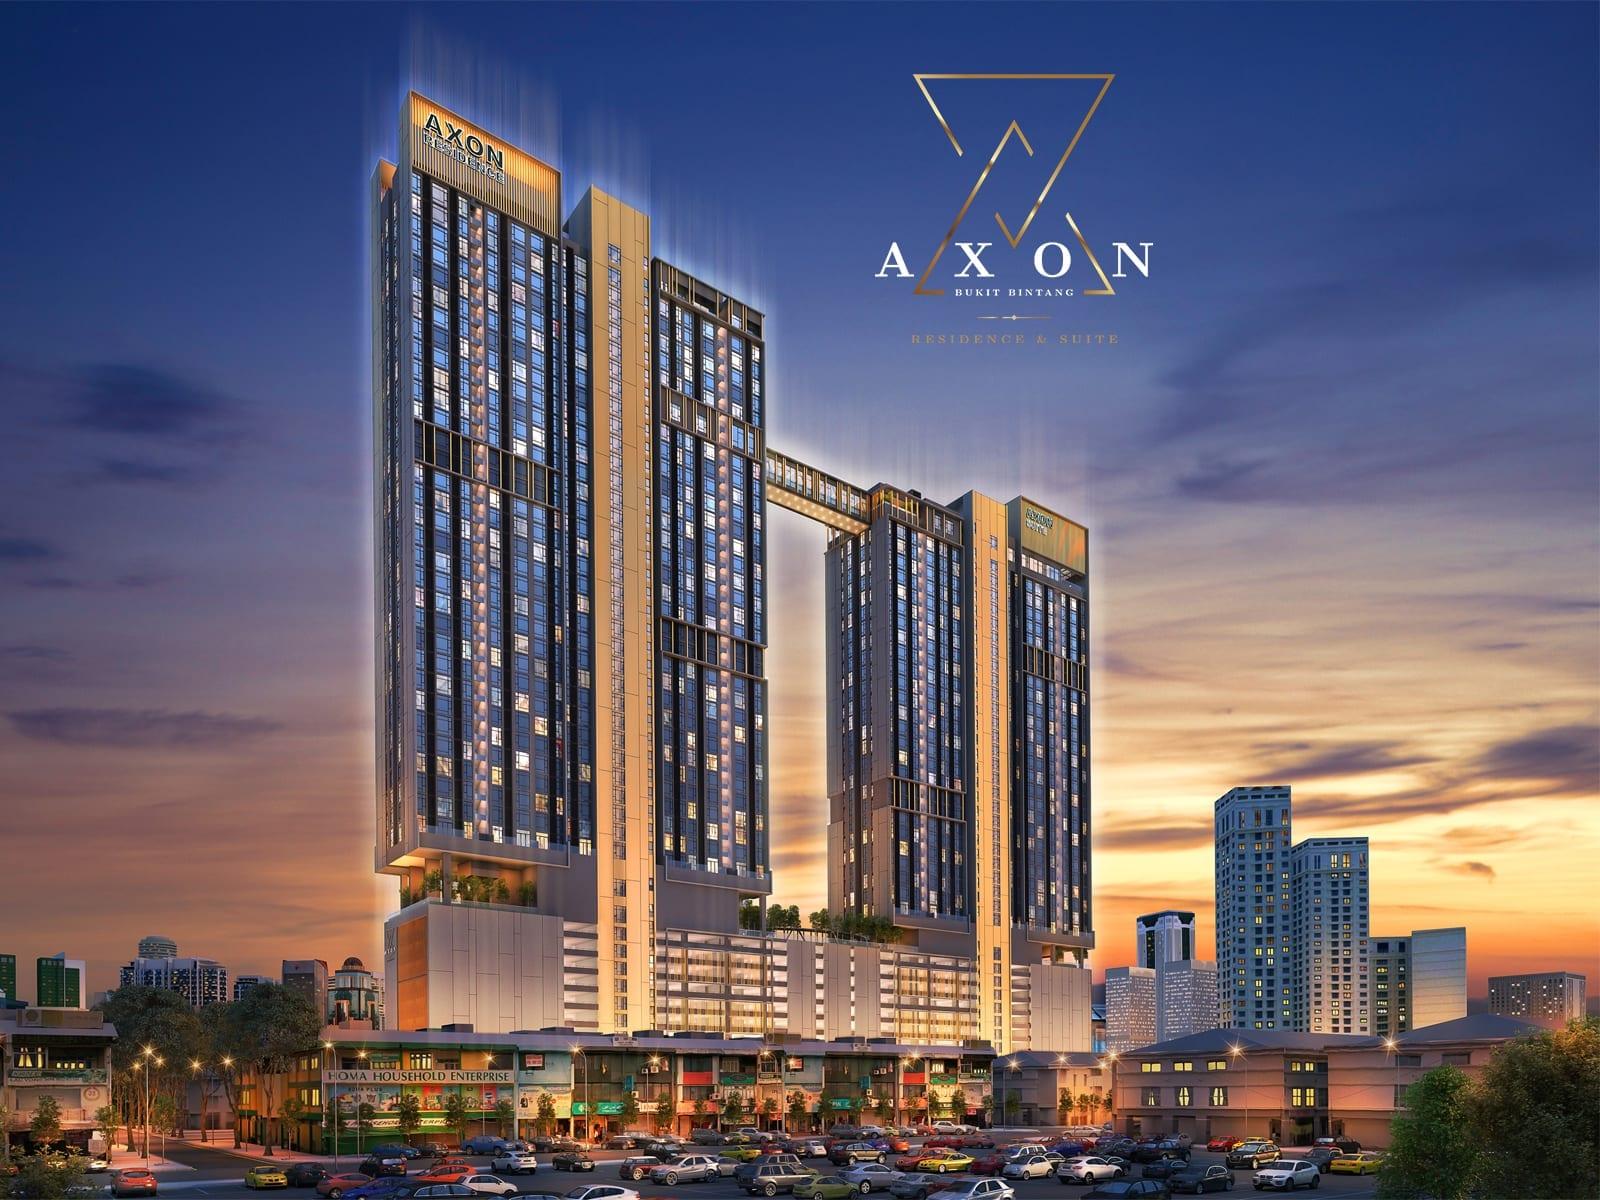 Axon Bukit Bintang